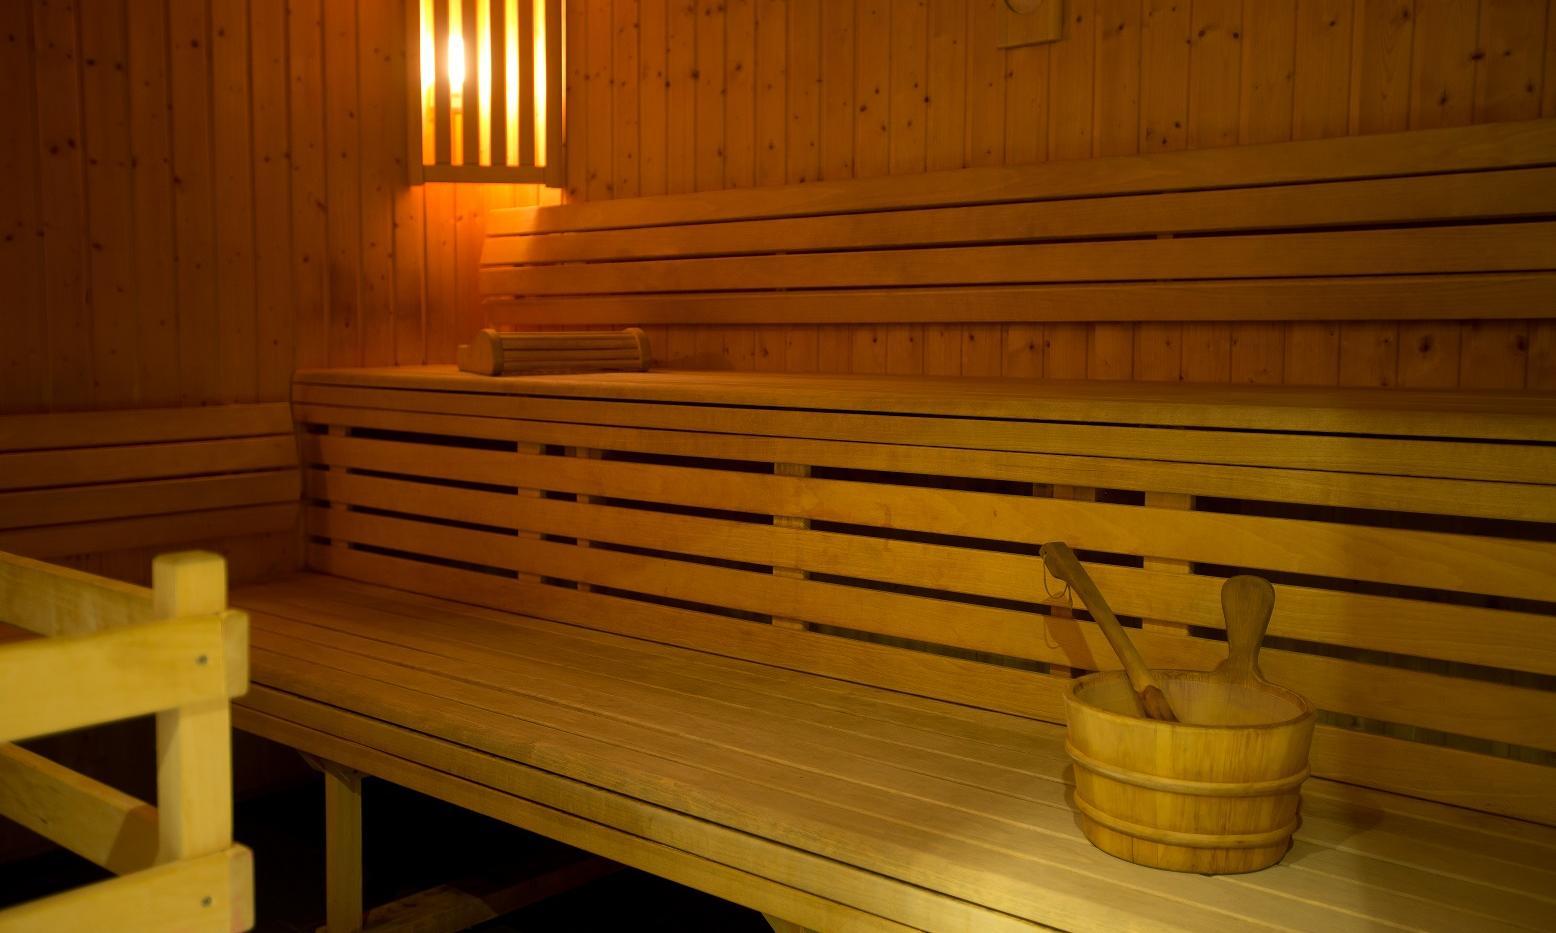 Espace d tente avec hammam et sauna for Hammam et sauna